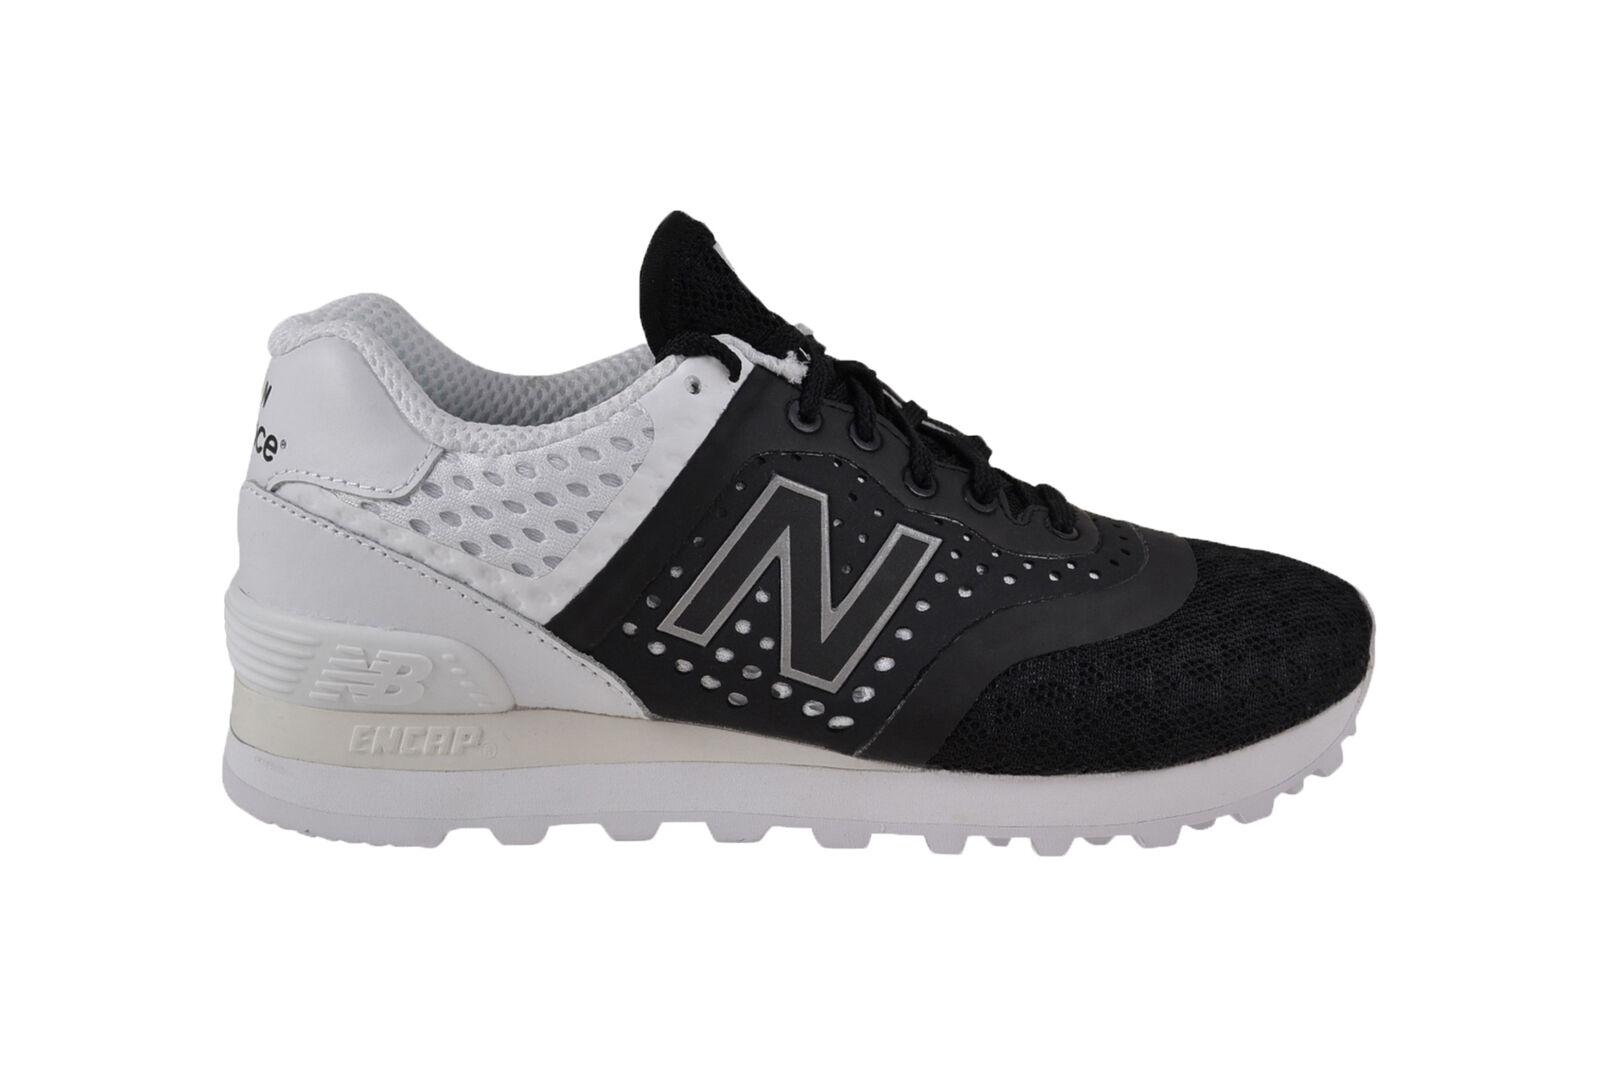 New Balance MTL574 MB black Sneaker/Schuhe